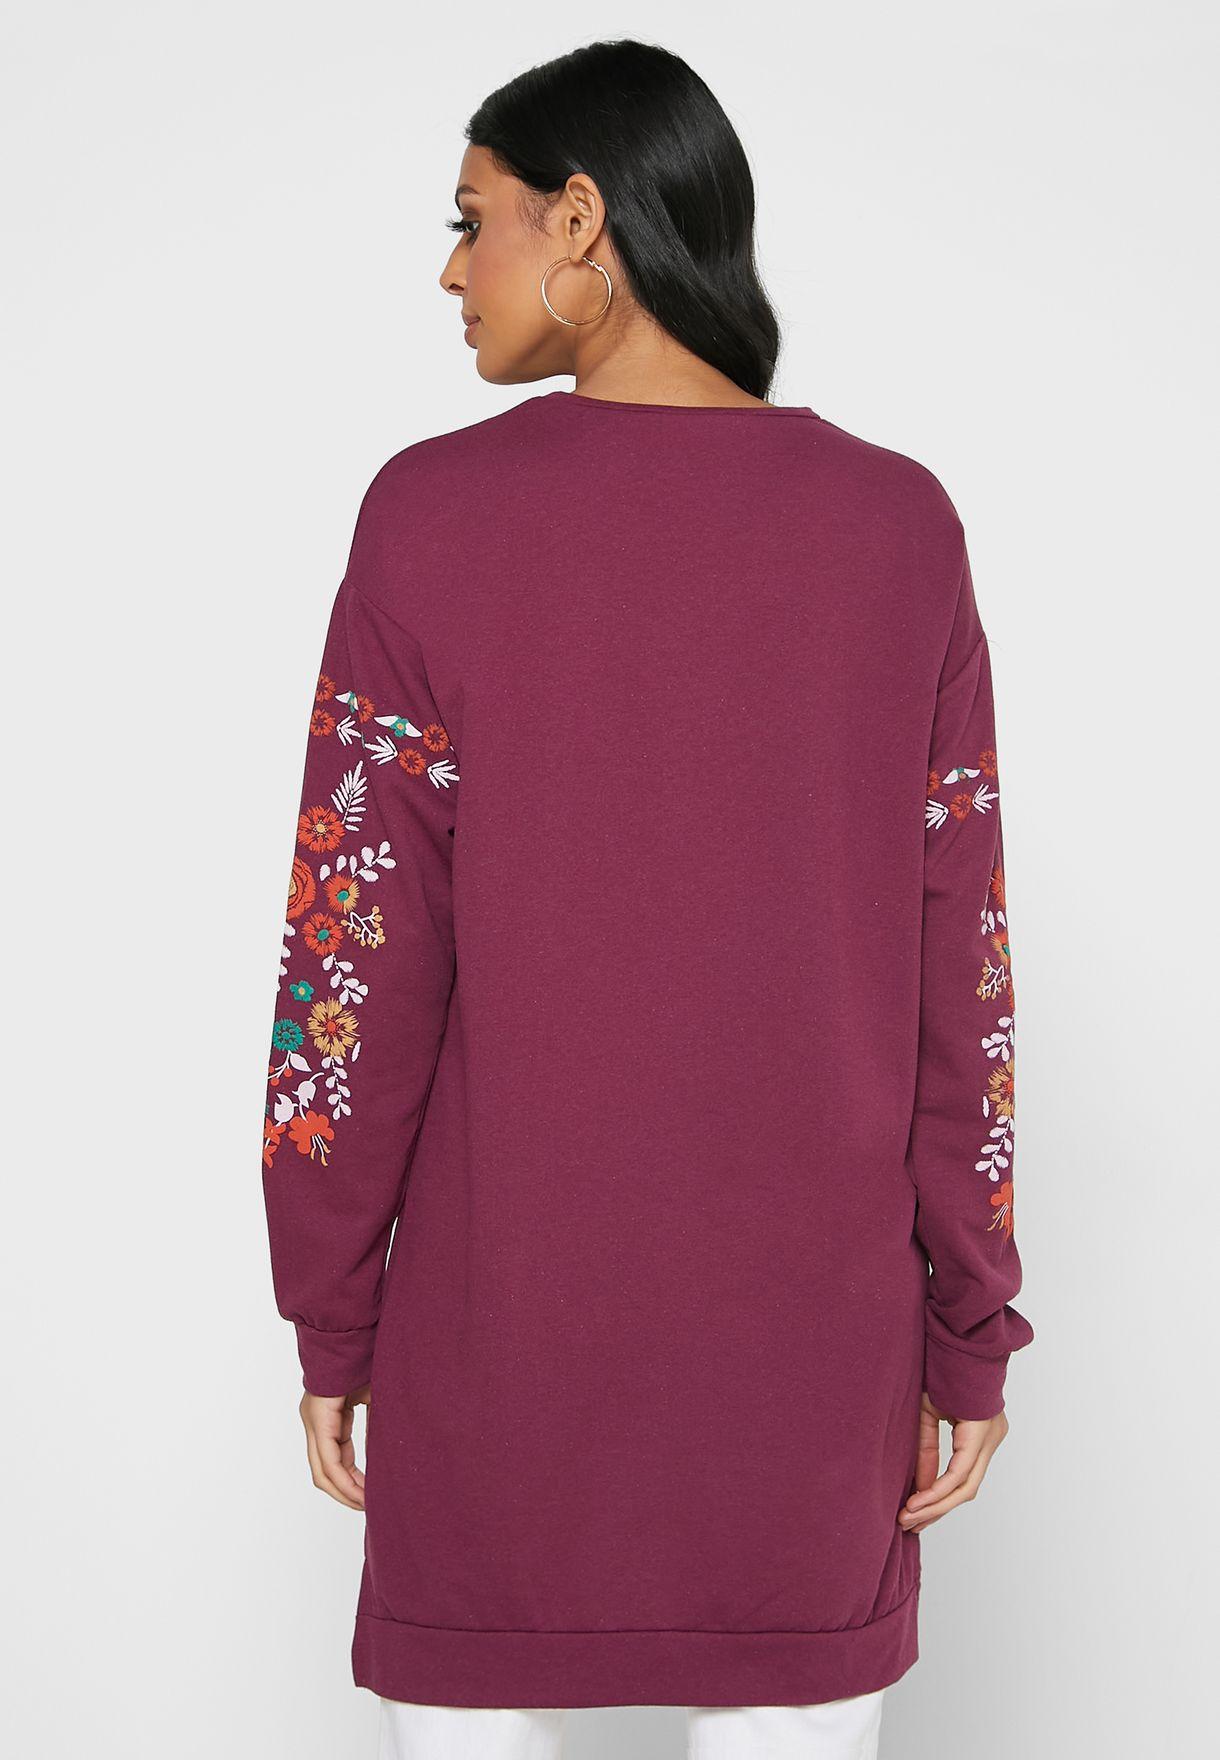 Floral Print Knitted Sweatshirt